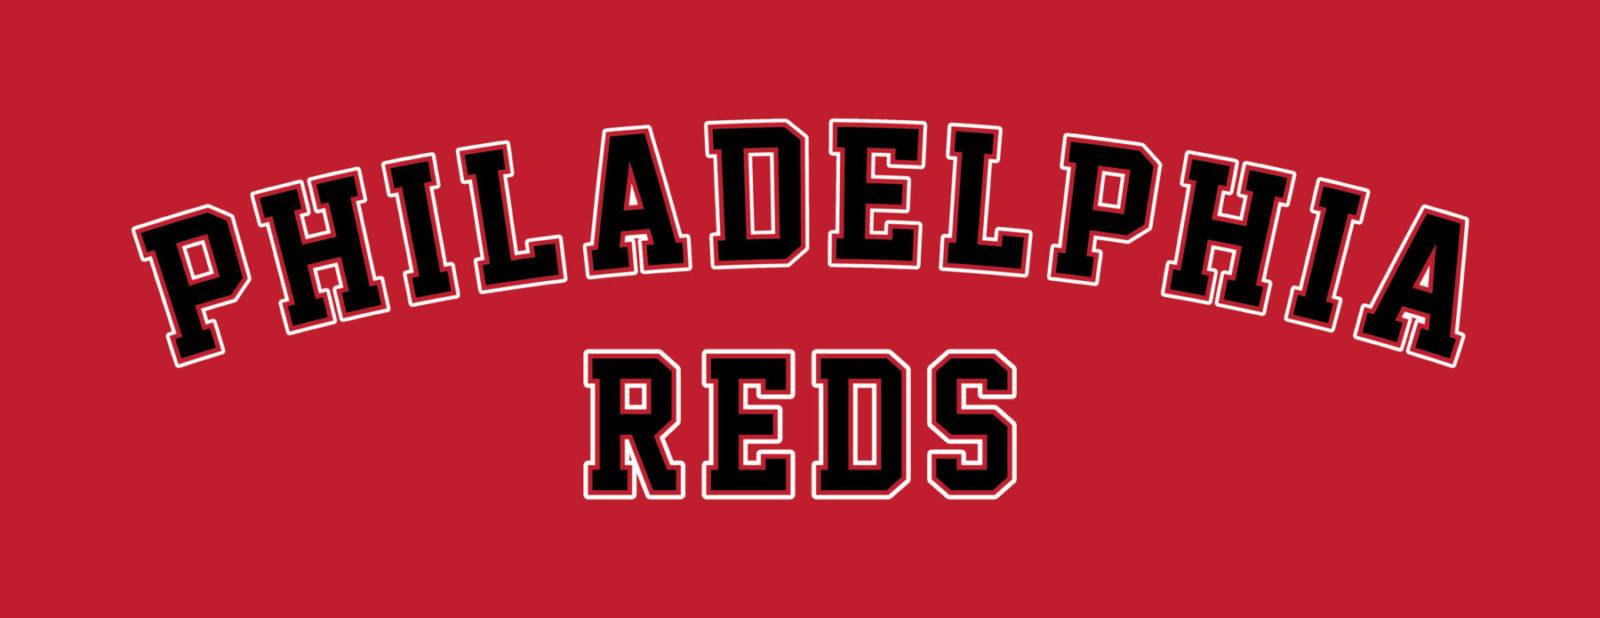 The Logo of Philadelphia Reds.